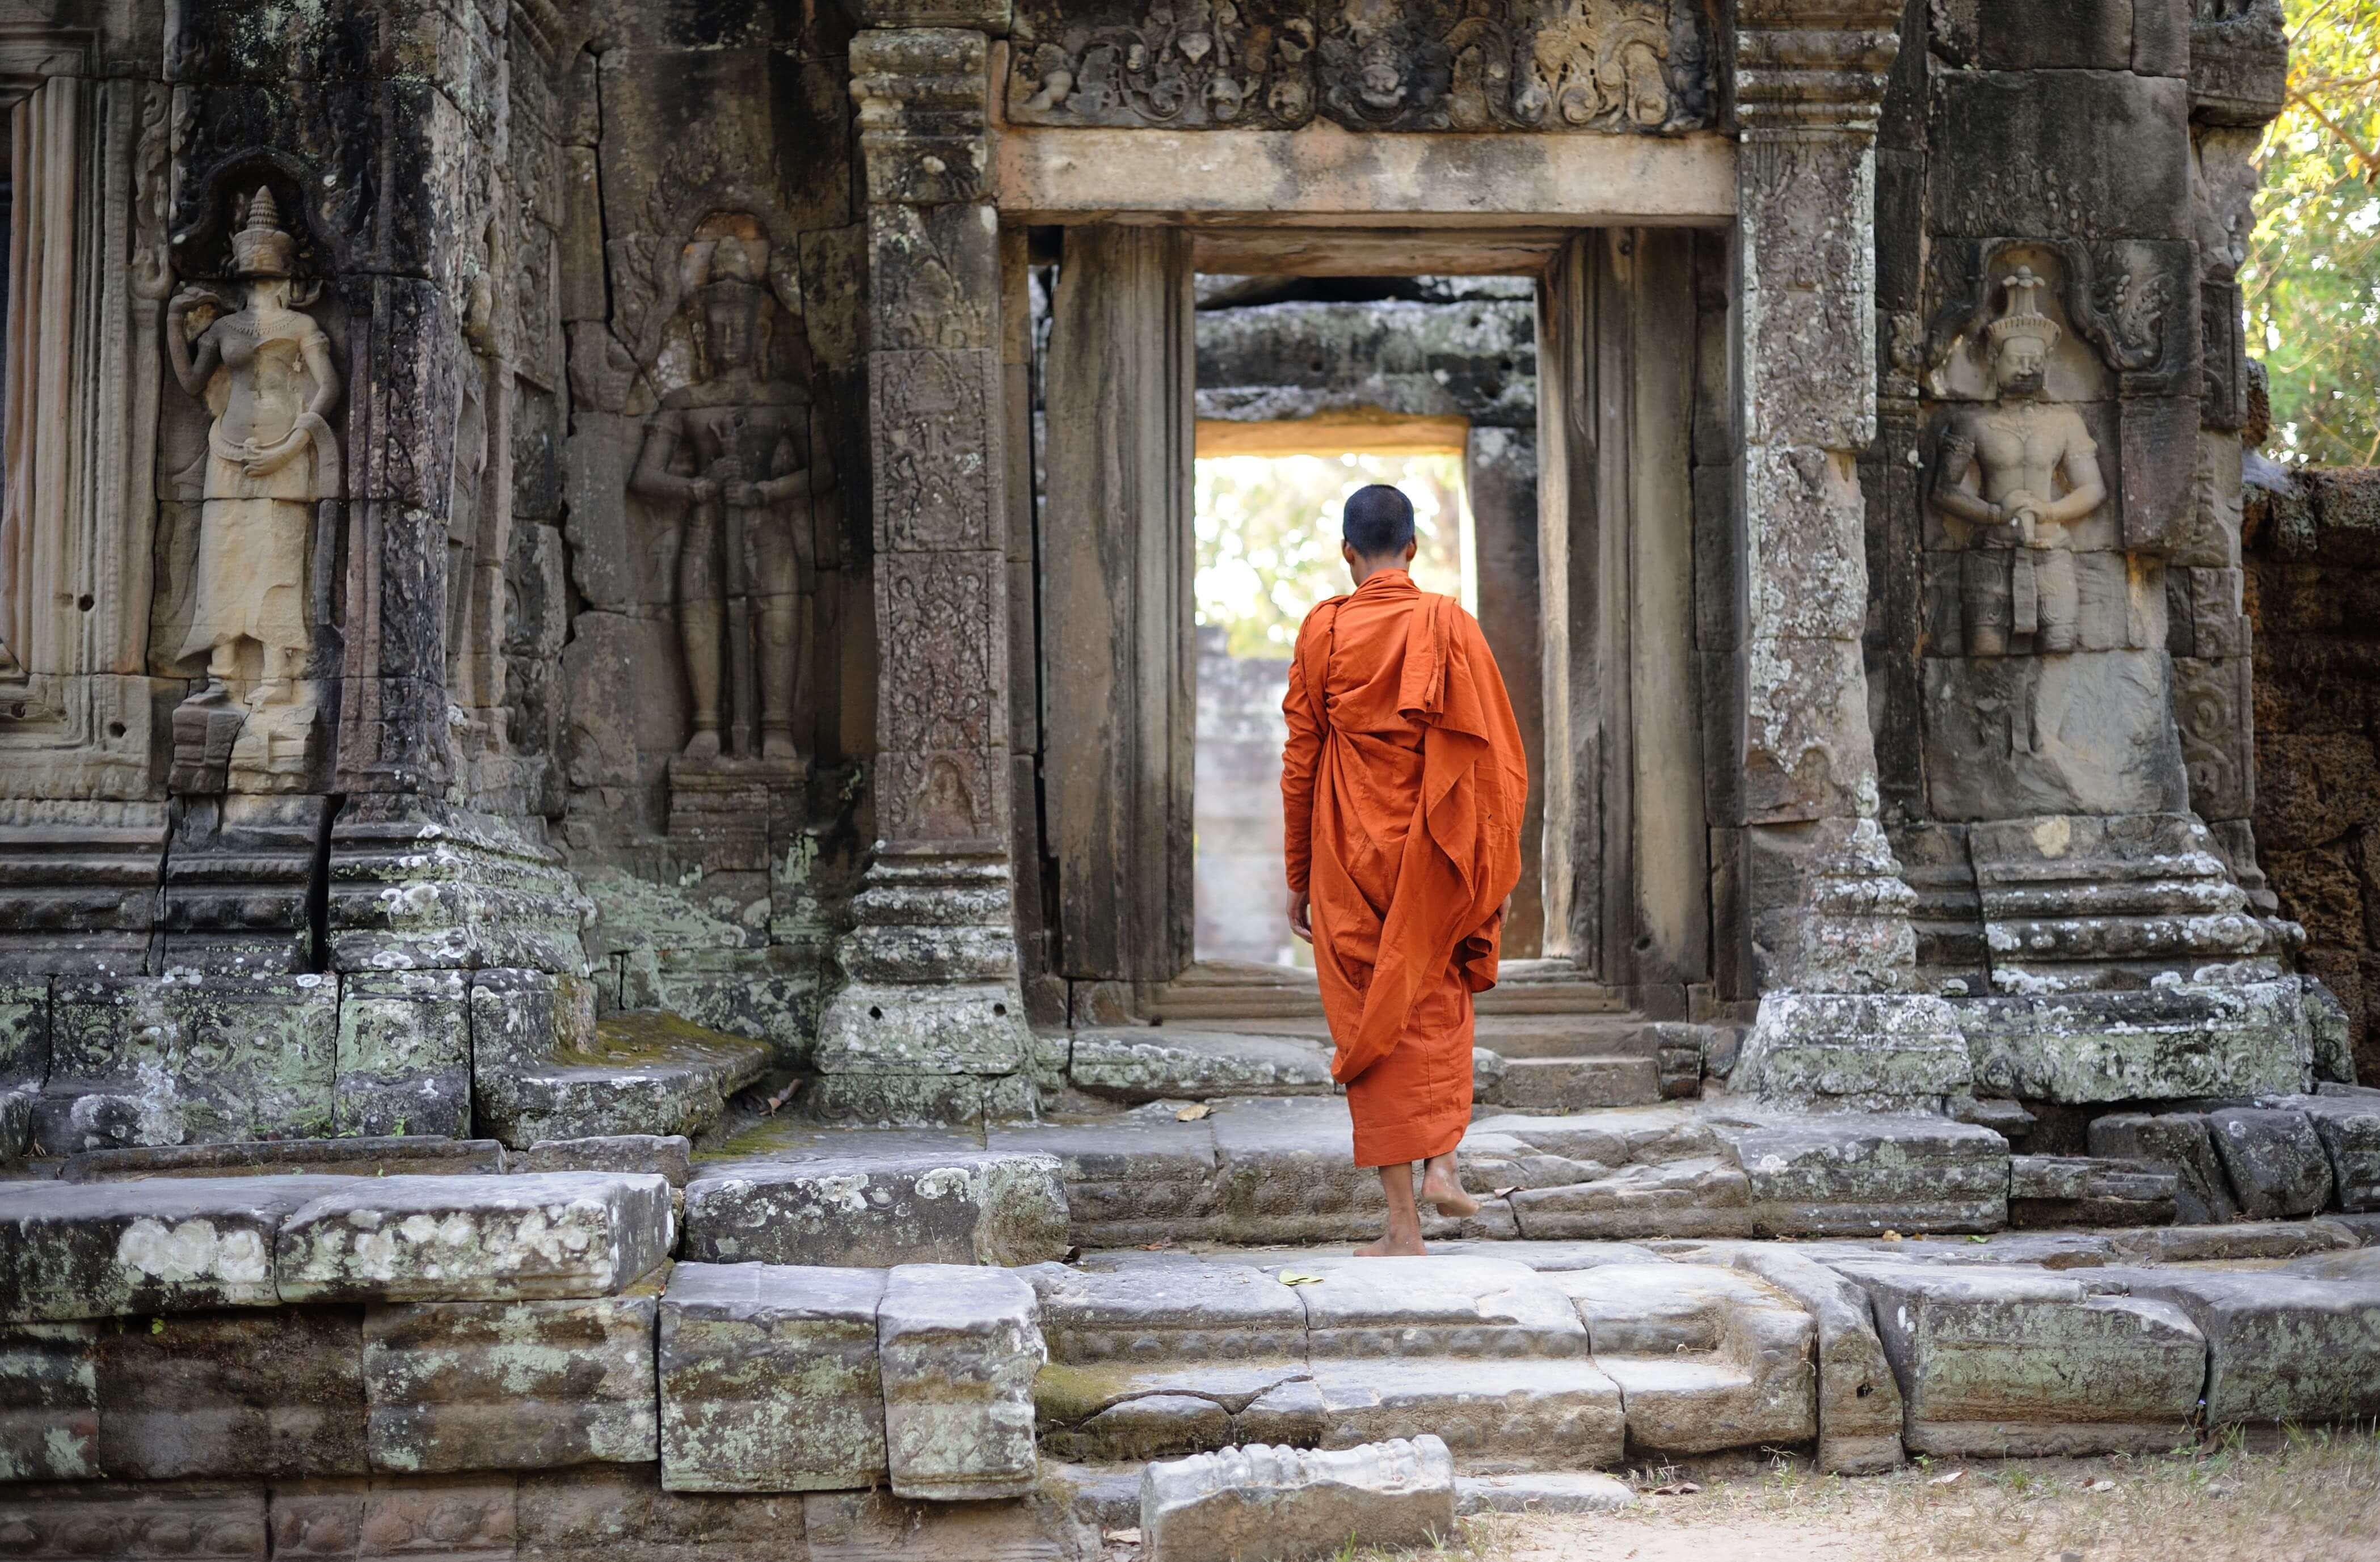 Banteay Kdei is a 12th century temple built by King Jayavarman VII.